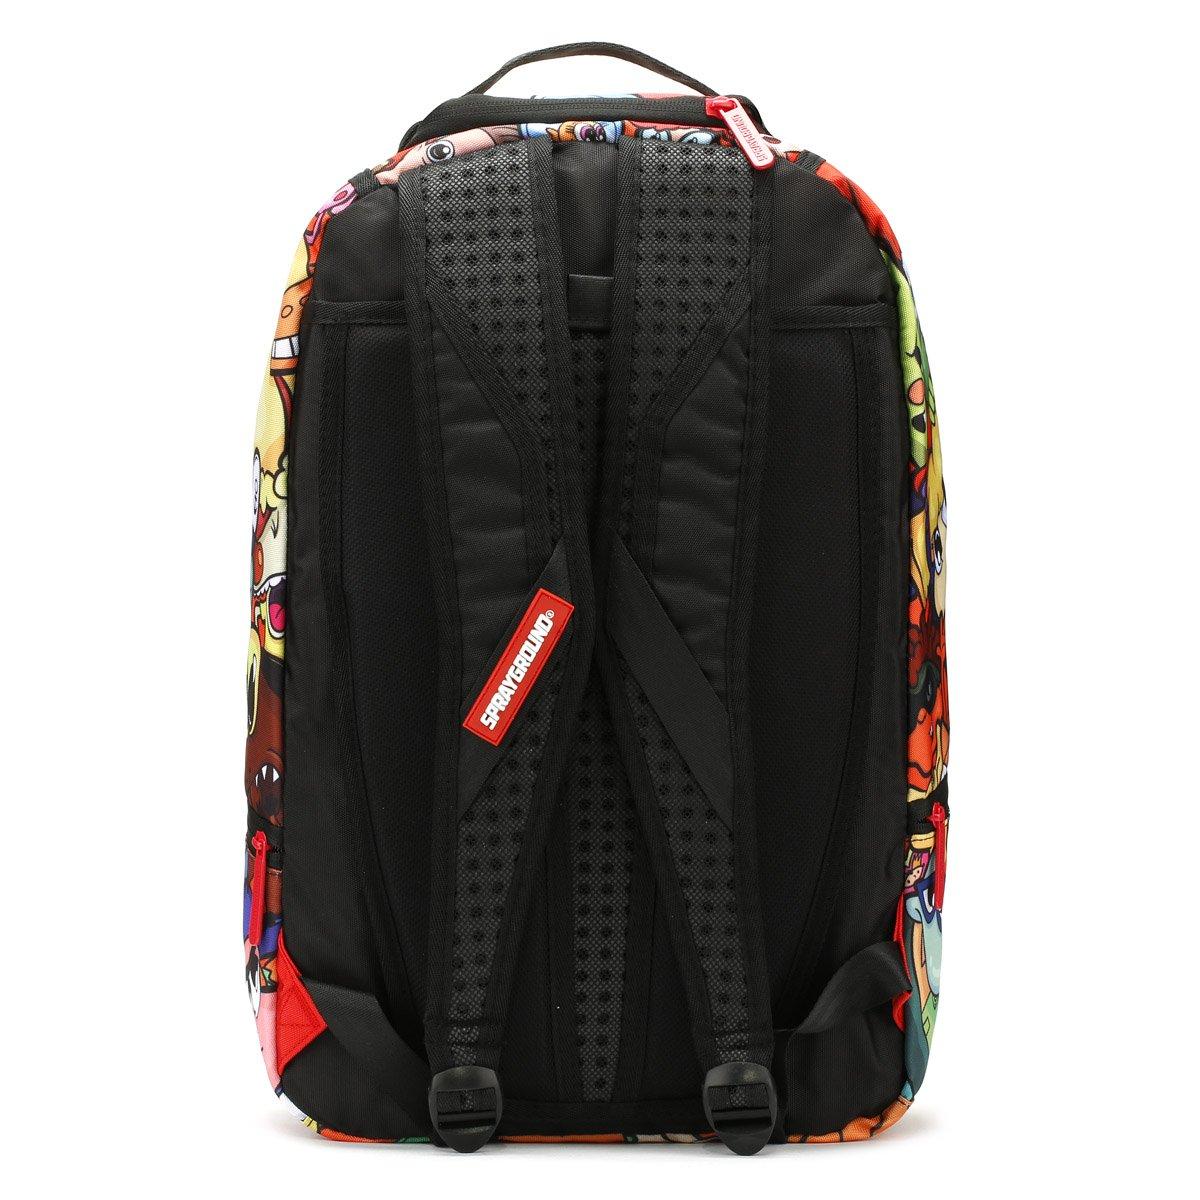 Sprayground 90s anime nickelodeon backpack multi amazon co uk shoes bags